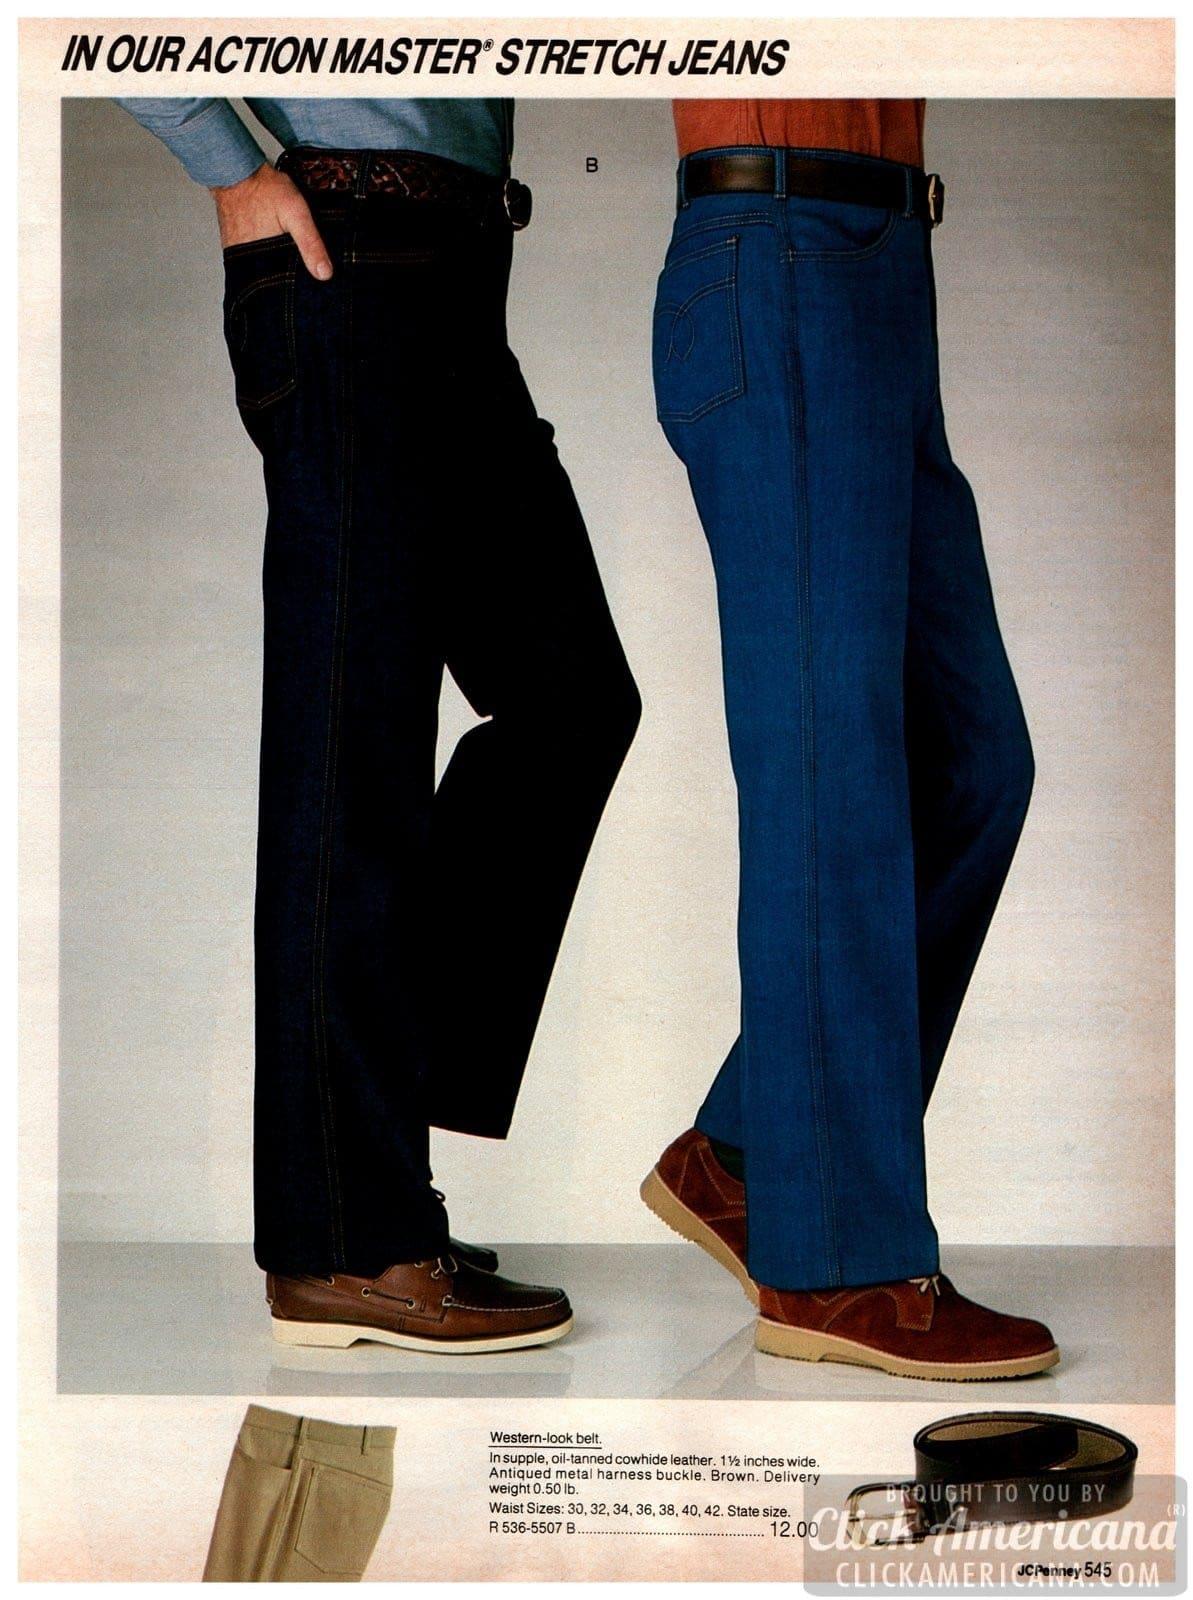 Action Master stretch jeans for men in dark wash and blue denim